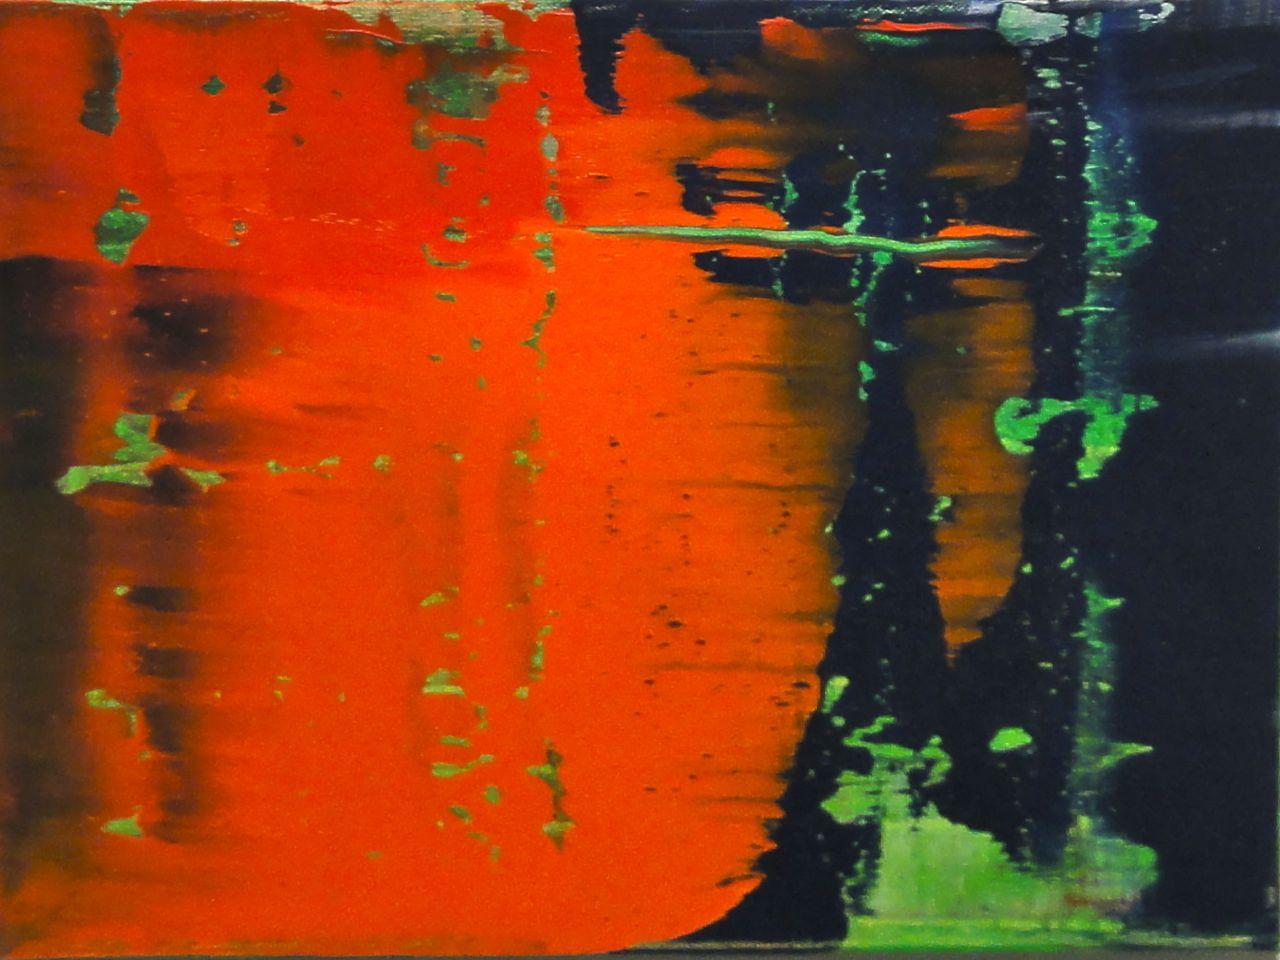 Grun-Blau-Rot 789-38, 1993,